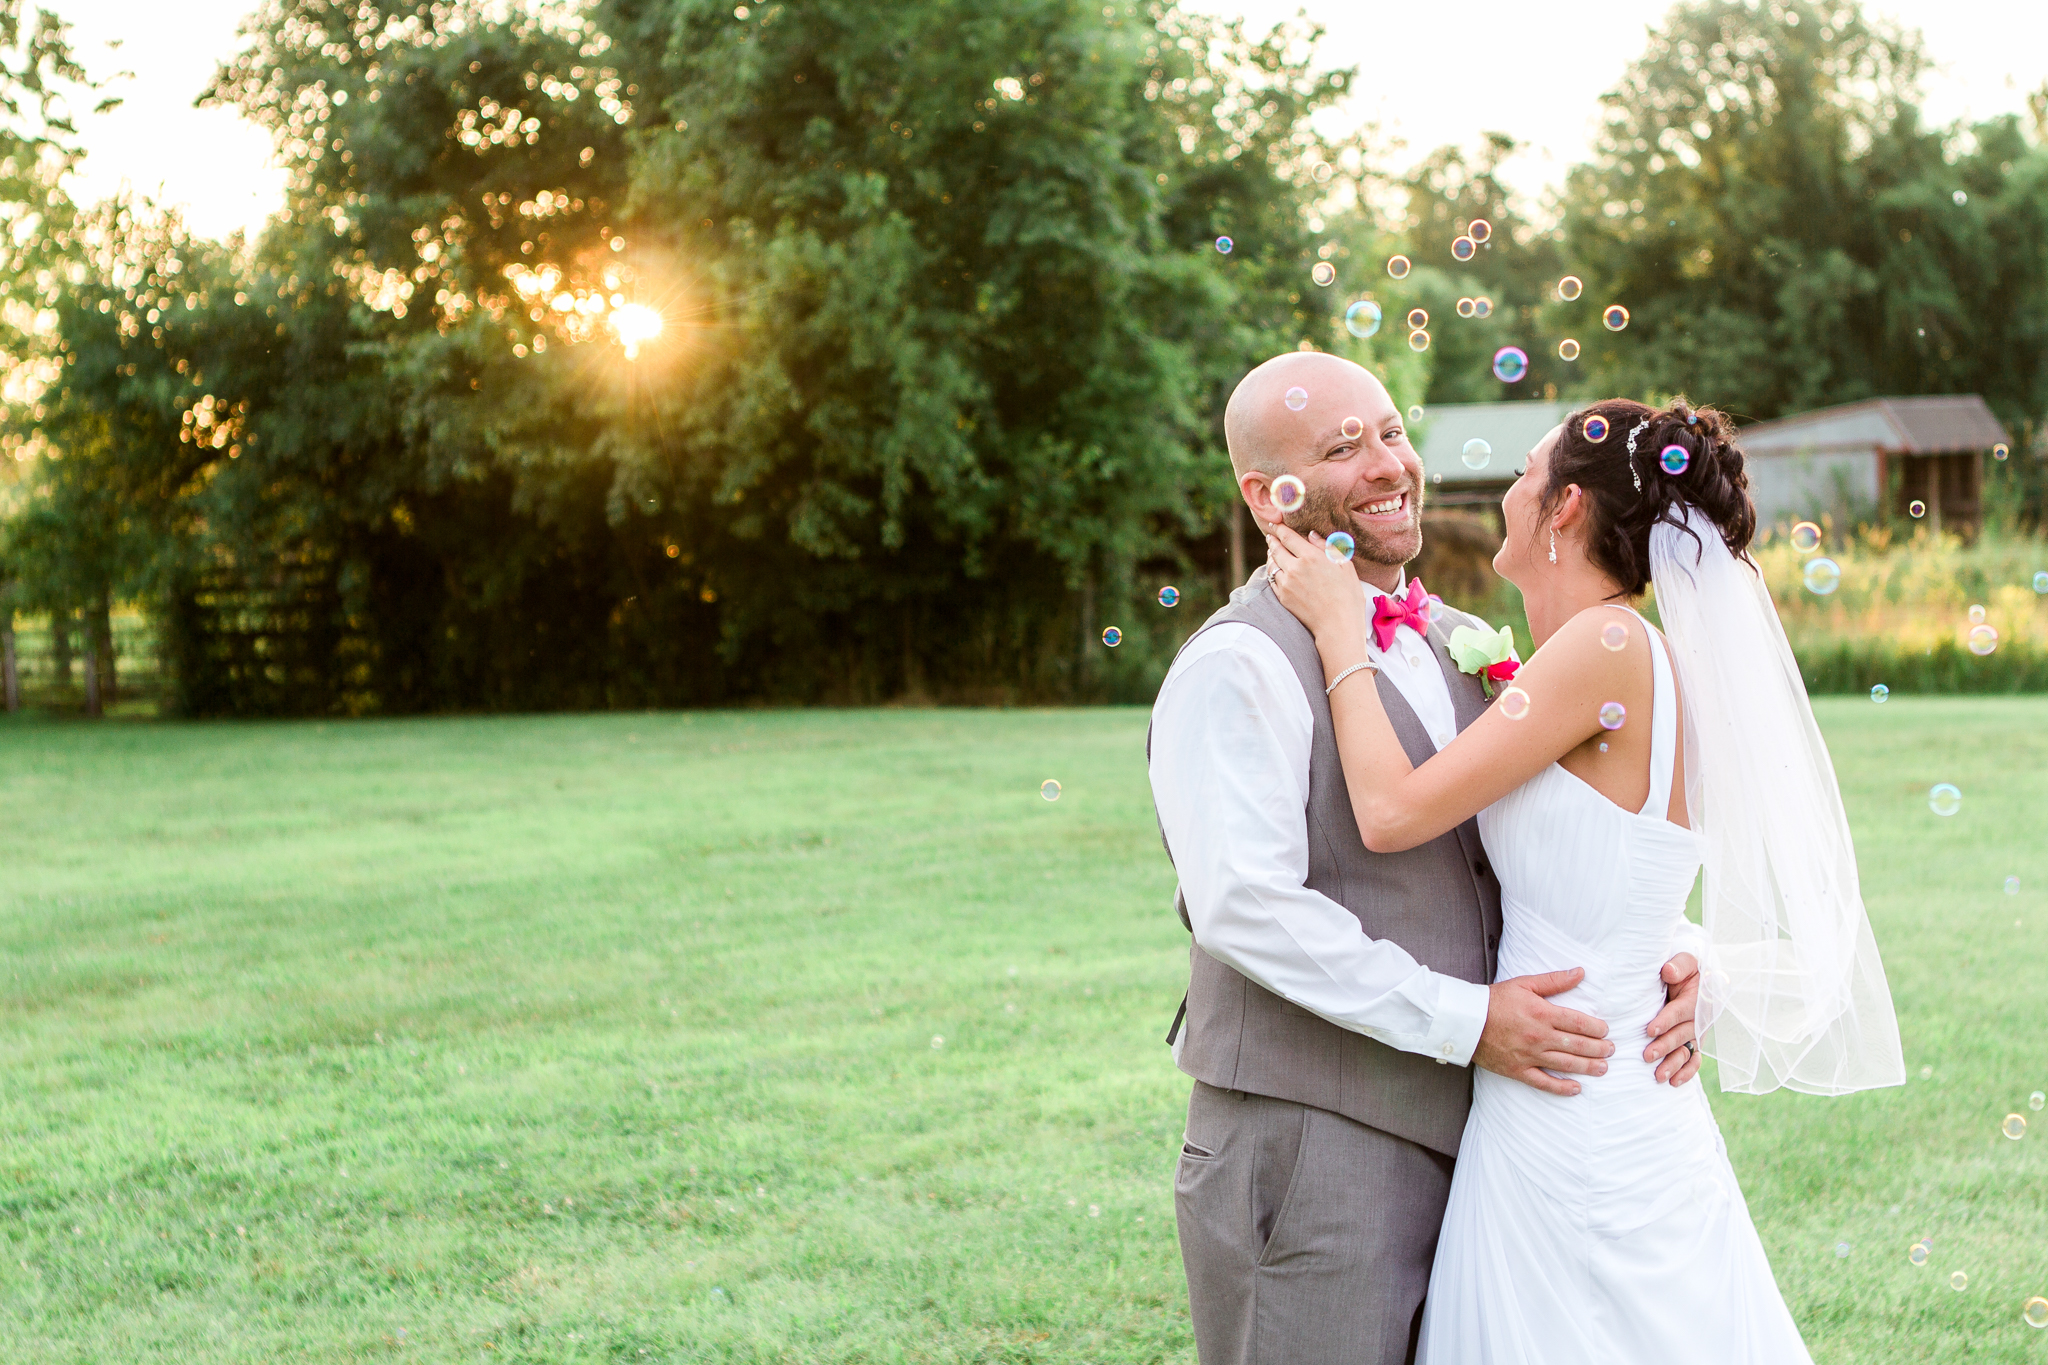 Richmond Kentucky Wedding Photographer - Ariana Jordan Photography -13-2.jpg